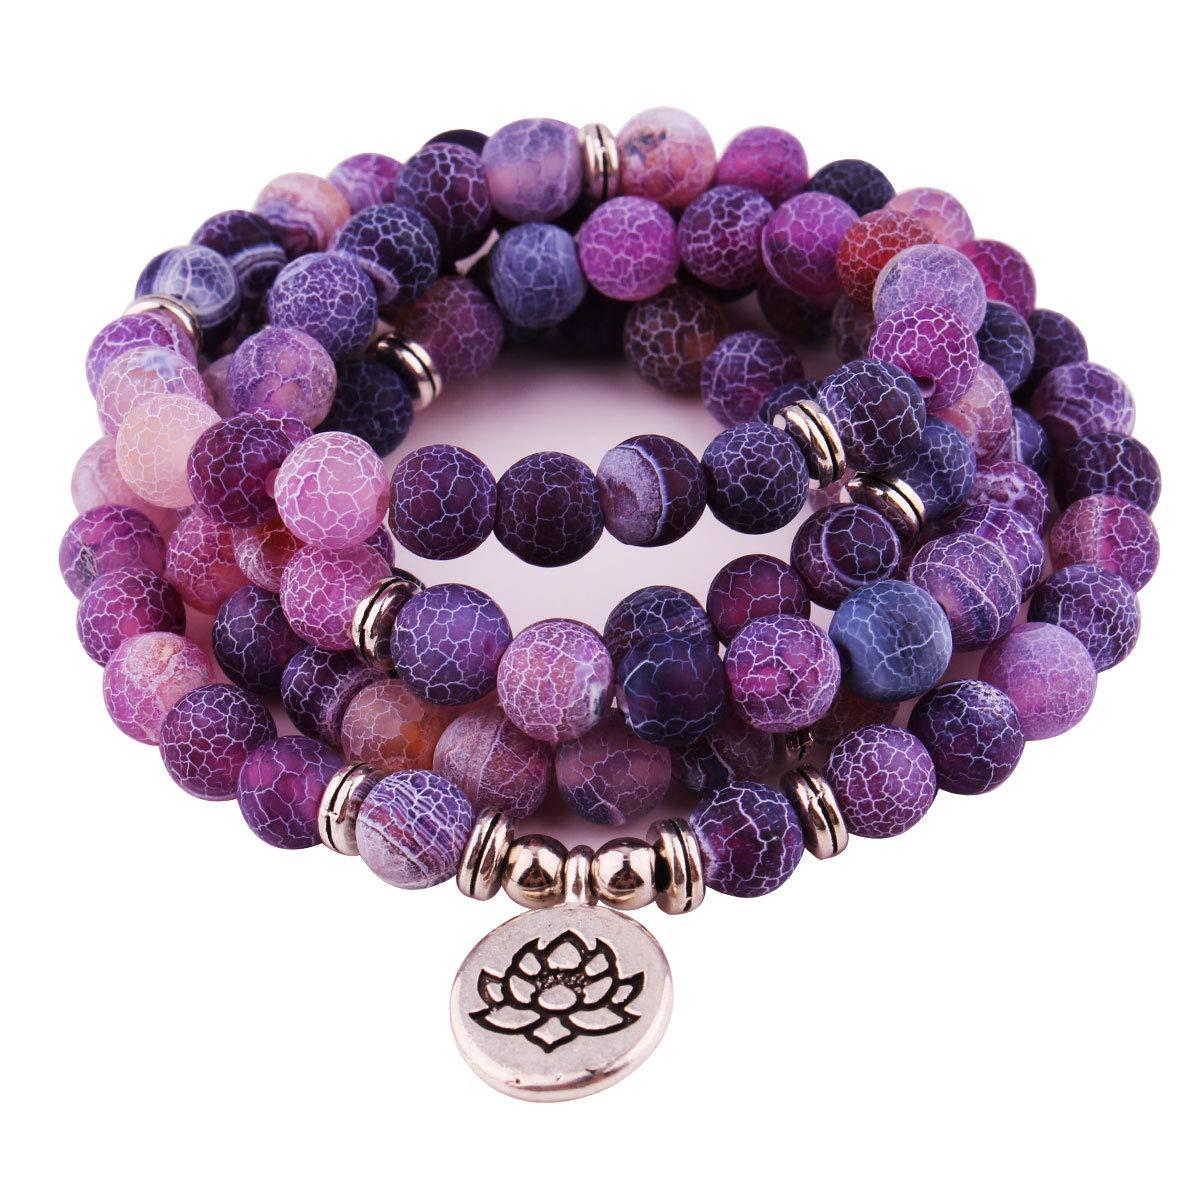 GVUSMIL 8mm 108 Mala Beads Wrap Bracelet Necklace for Yoga Charm Bracelet Natural Gemstone Jewelry for Women Men (Purple Weathered Stone) by GVUSMIL